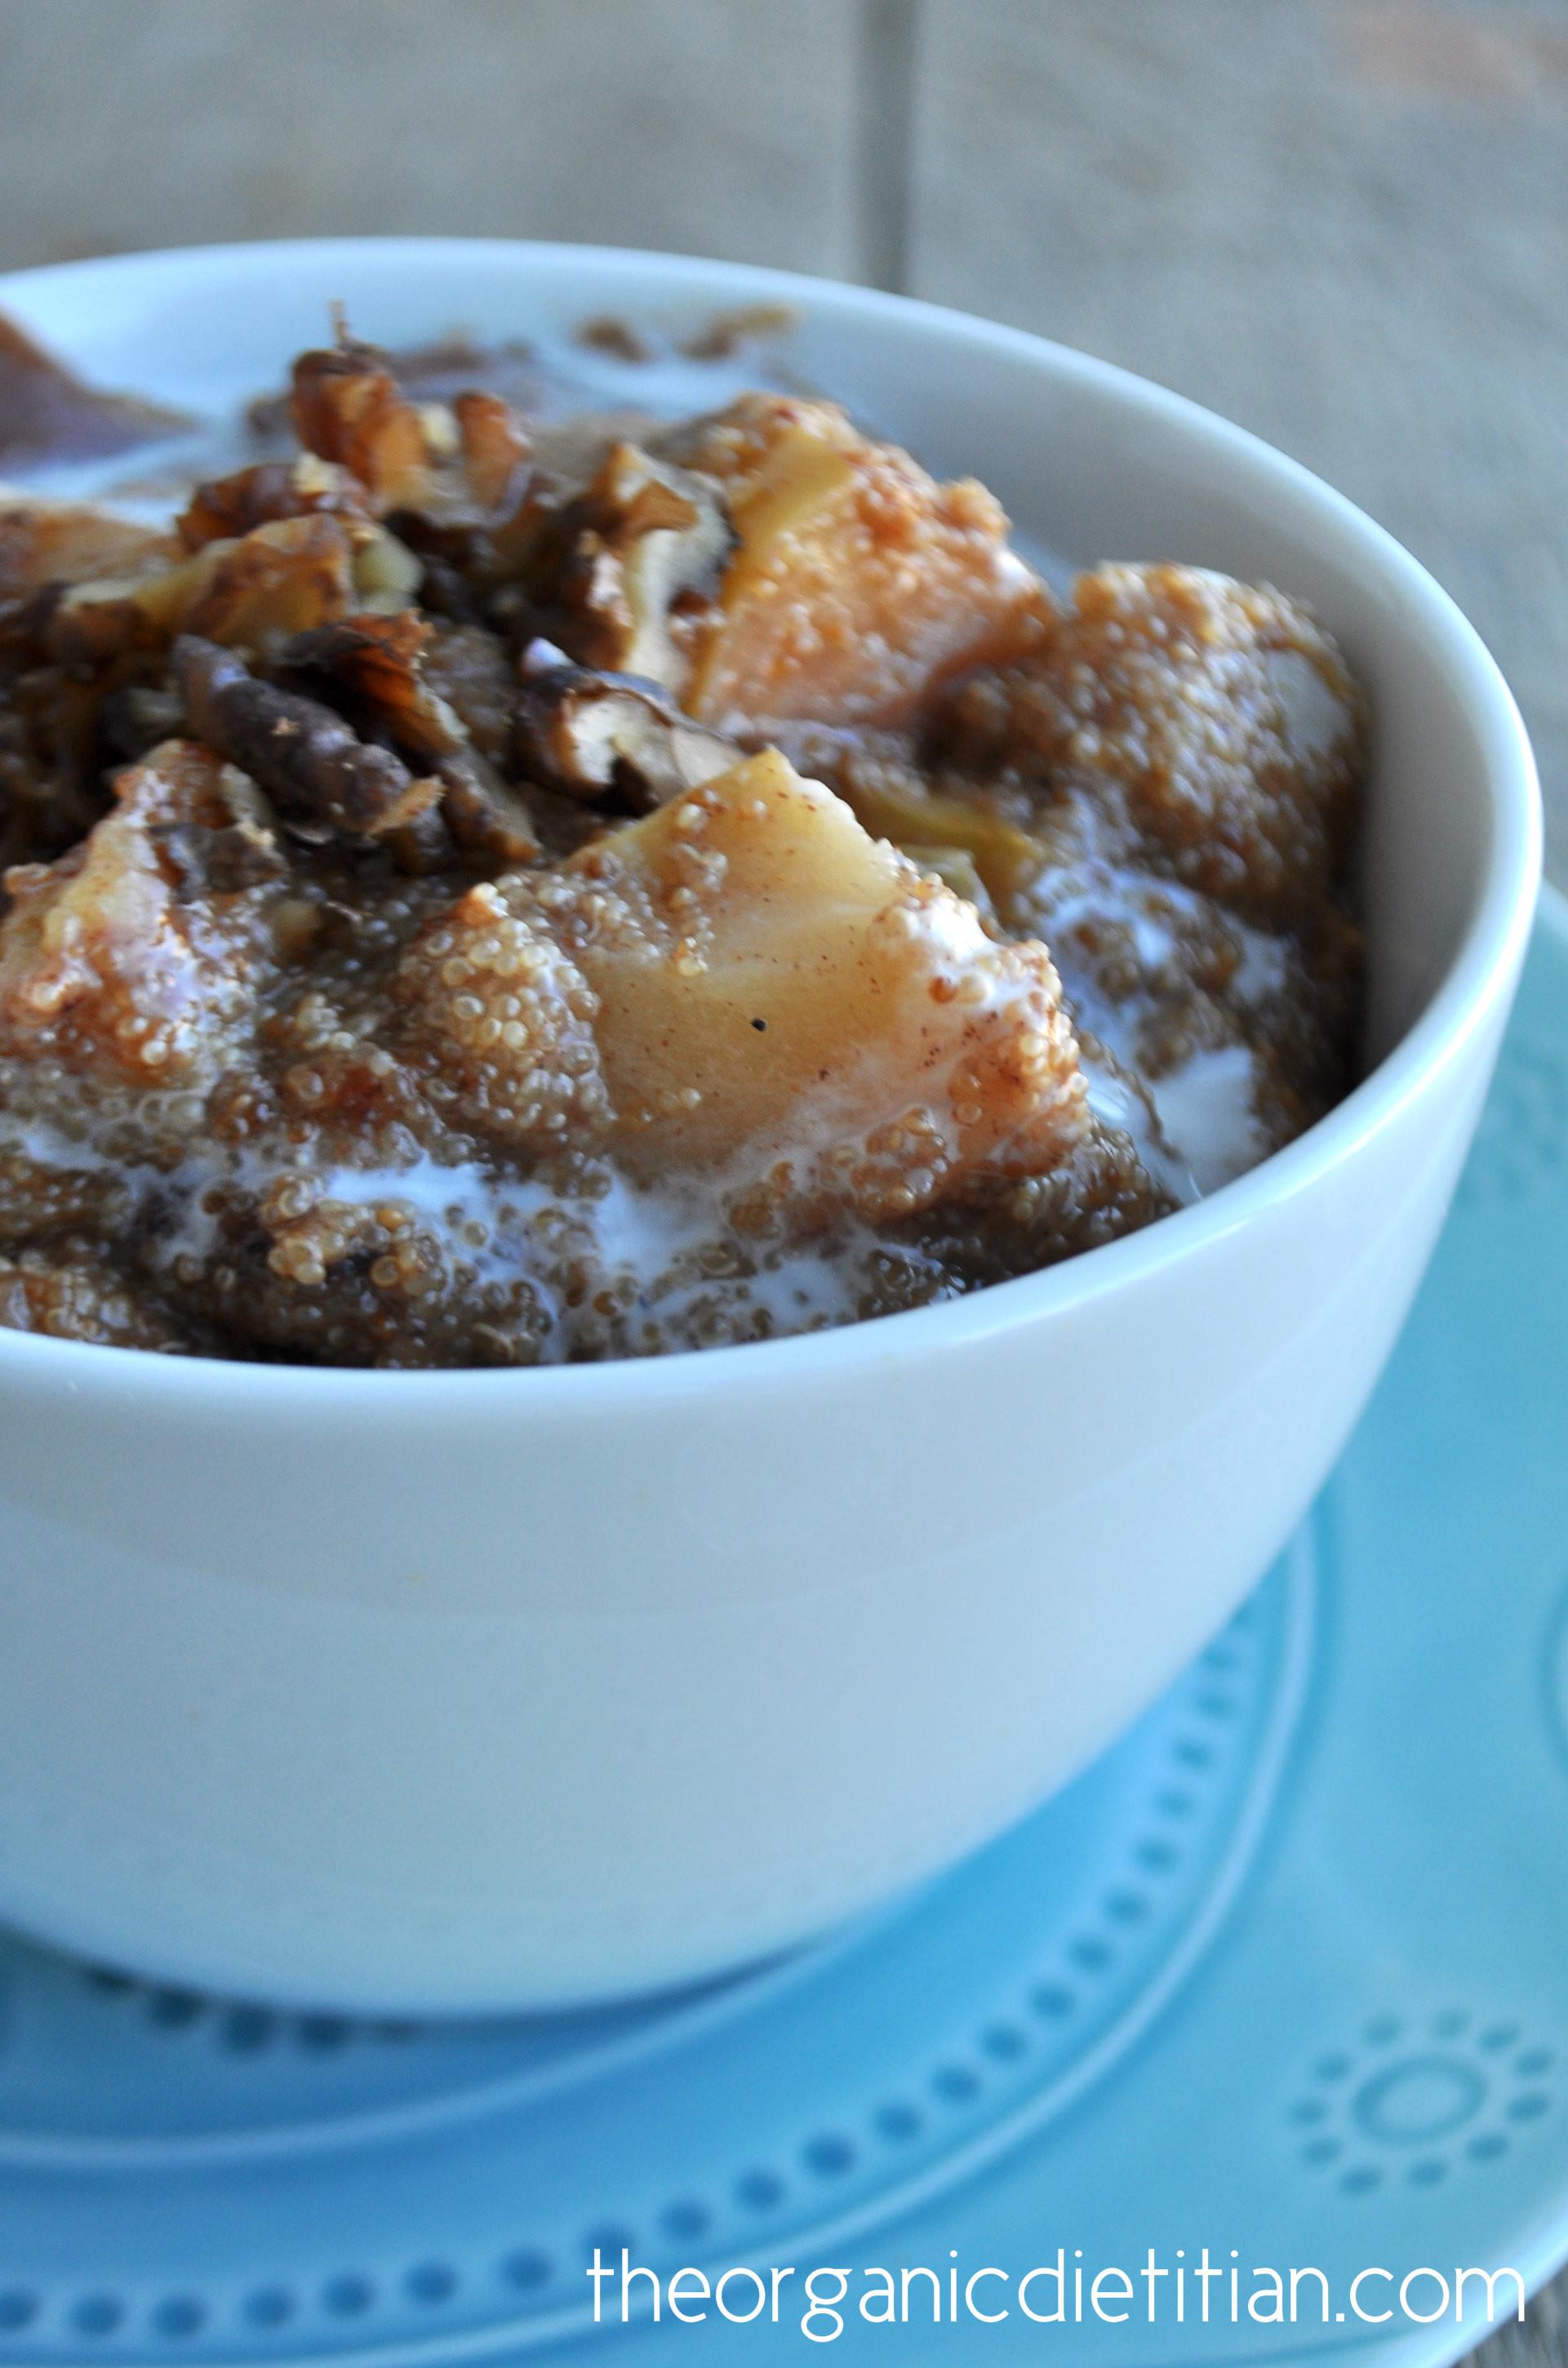 Crock Pot Apple Pie  Crock Pot Apple Pie Amaranth Porridge The Organic Dietitian